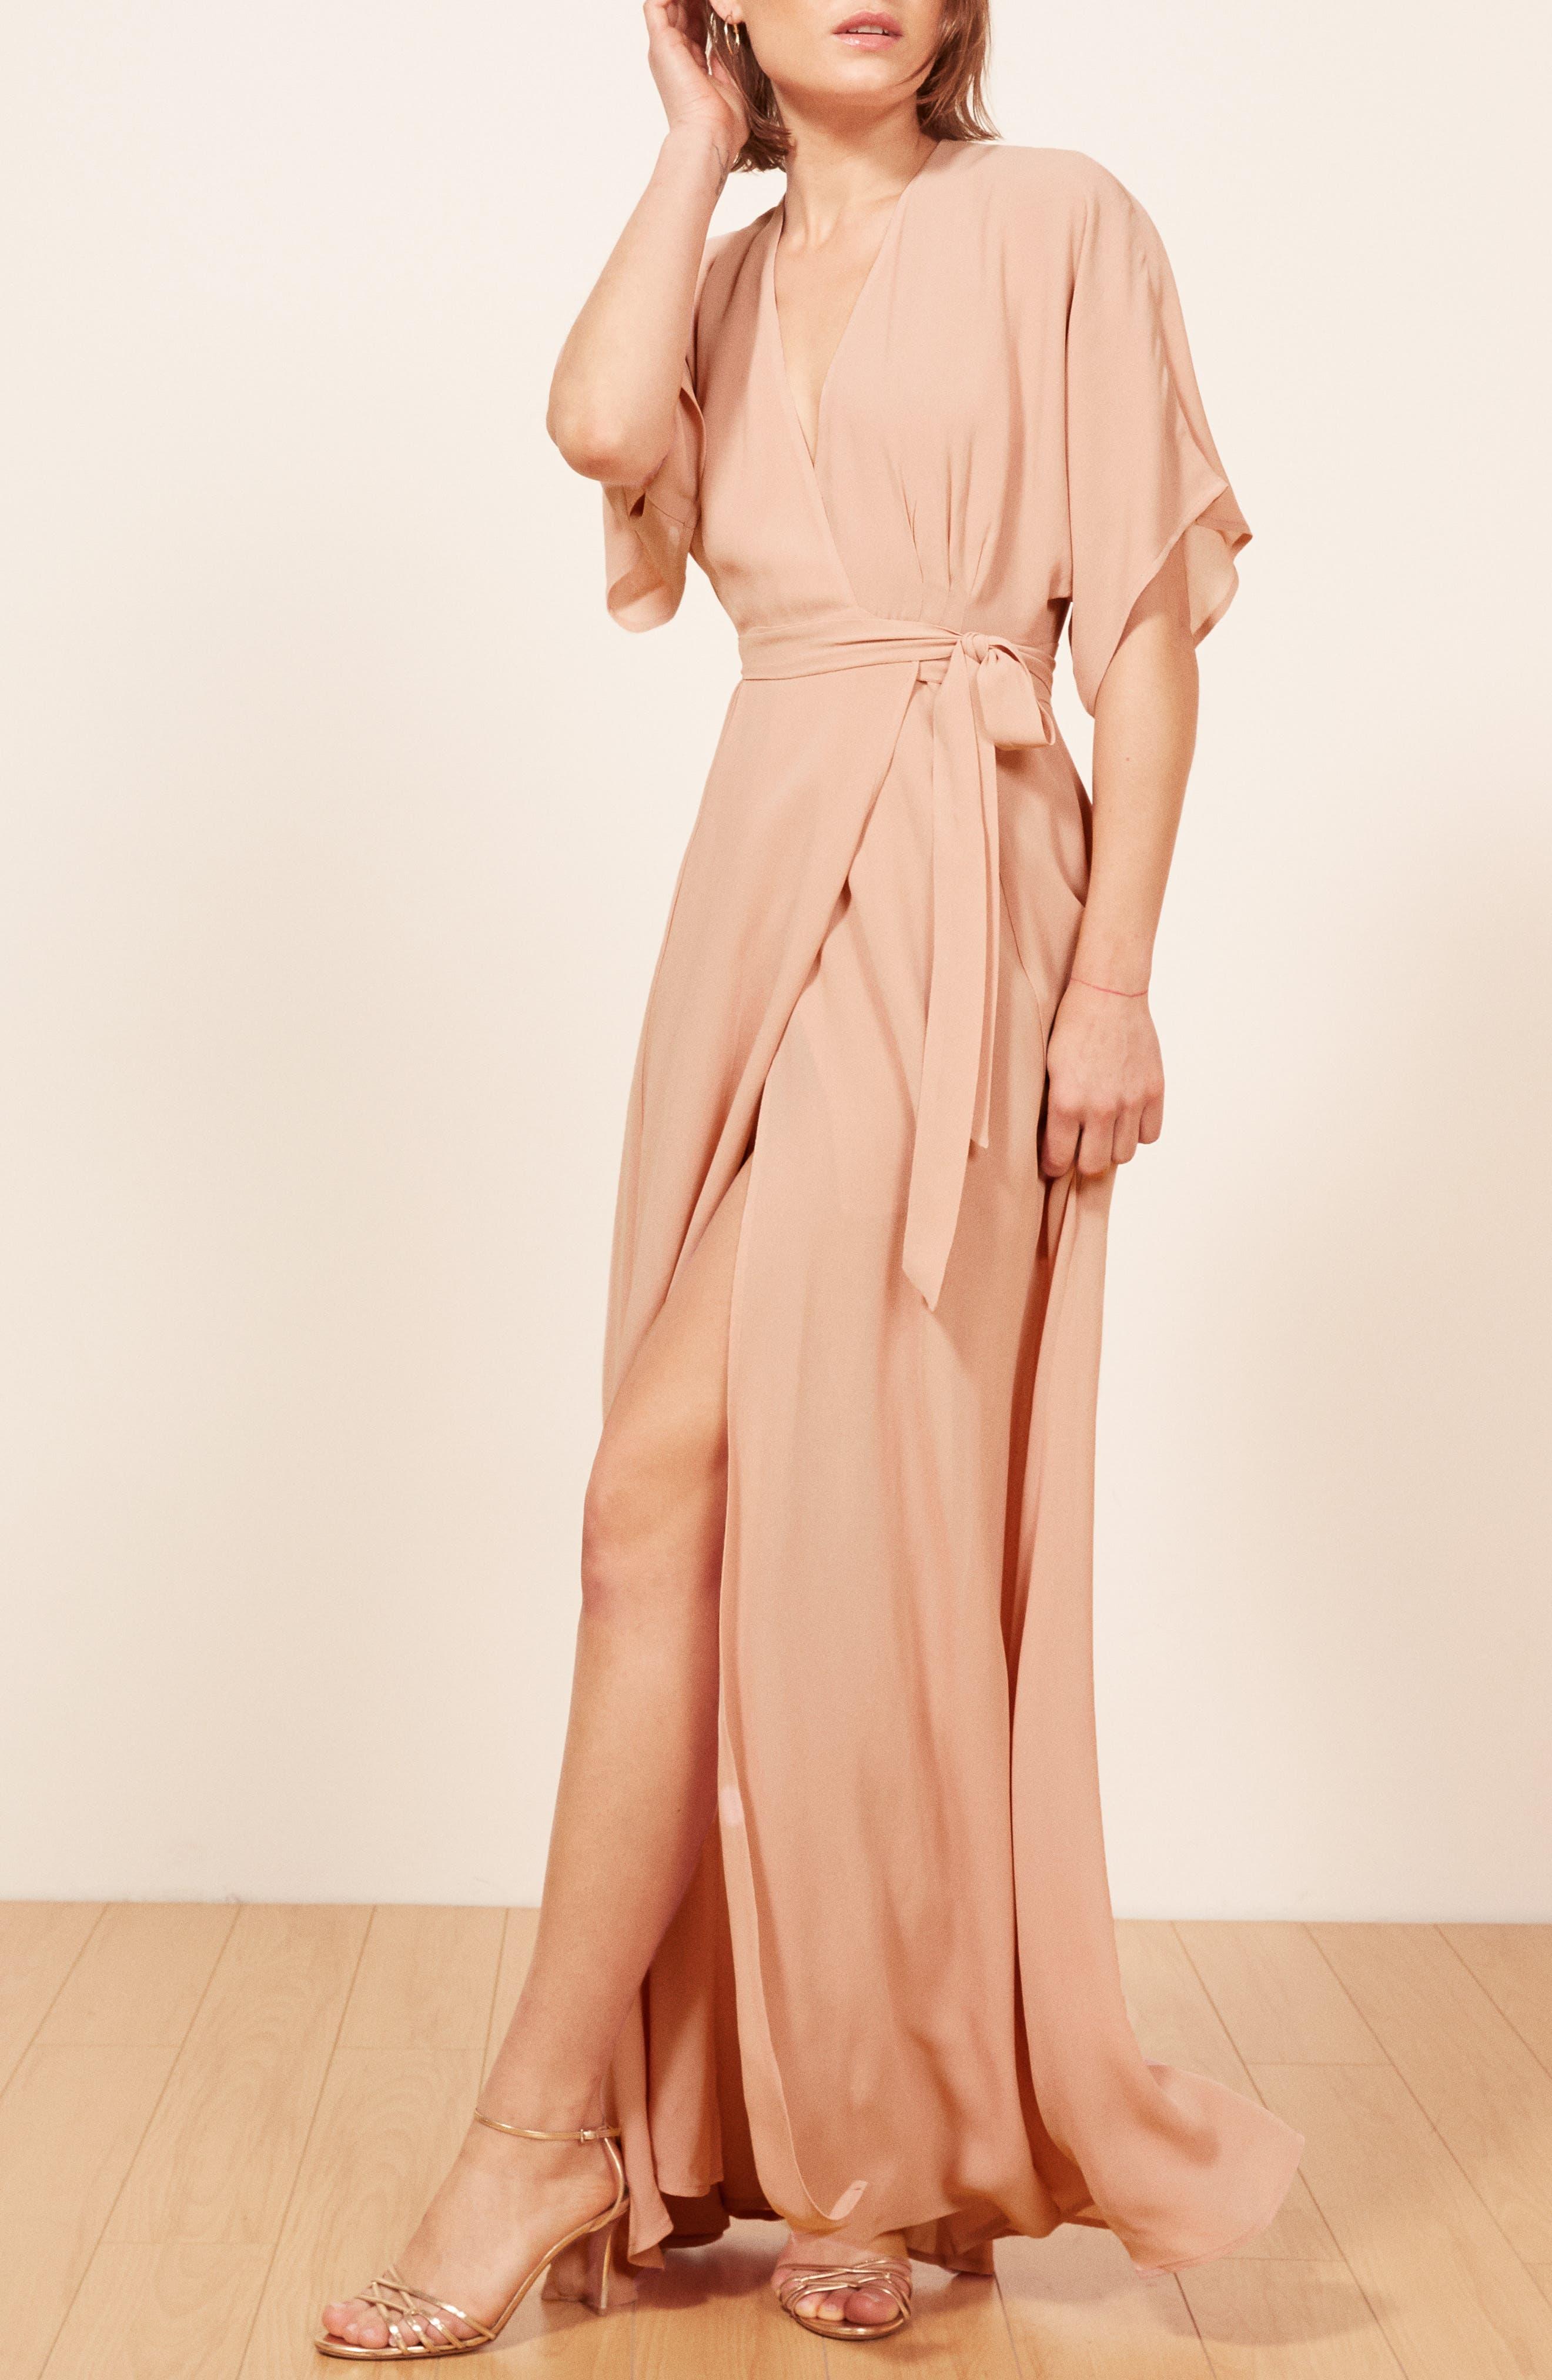 REFORMATION, Winslow Maxi Dress, Alternate thumbnail 5, color, BLUSH